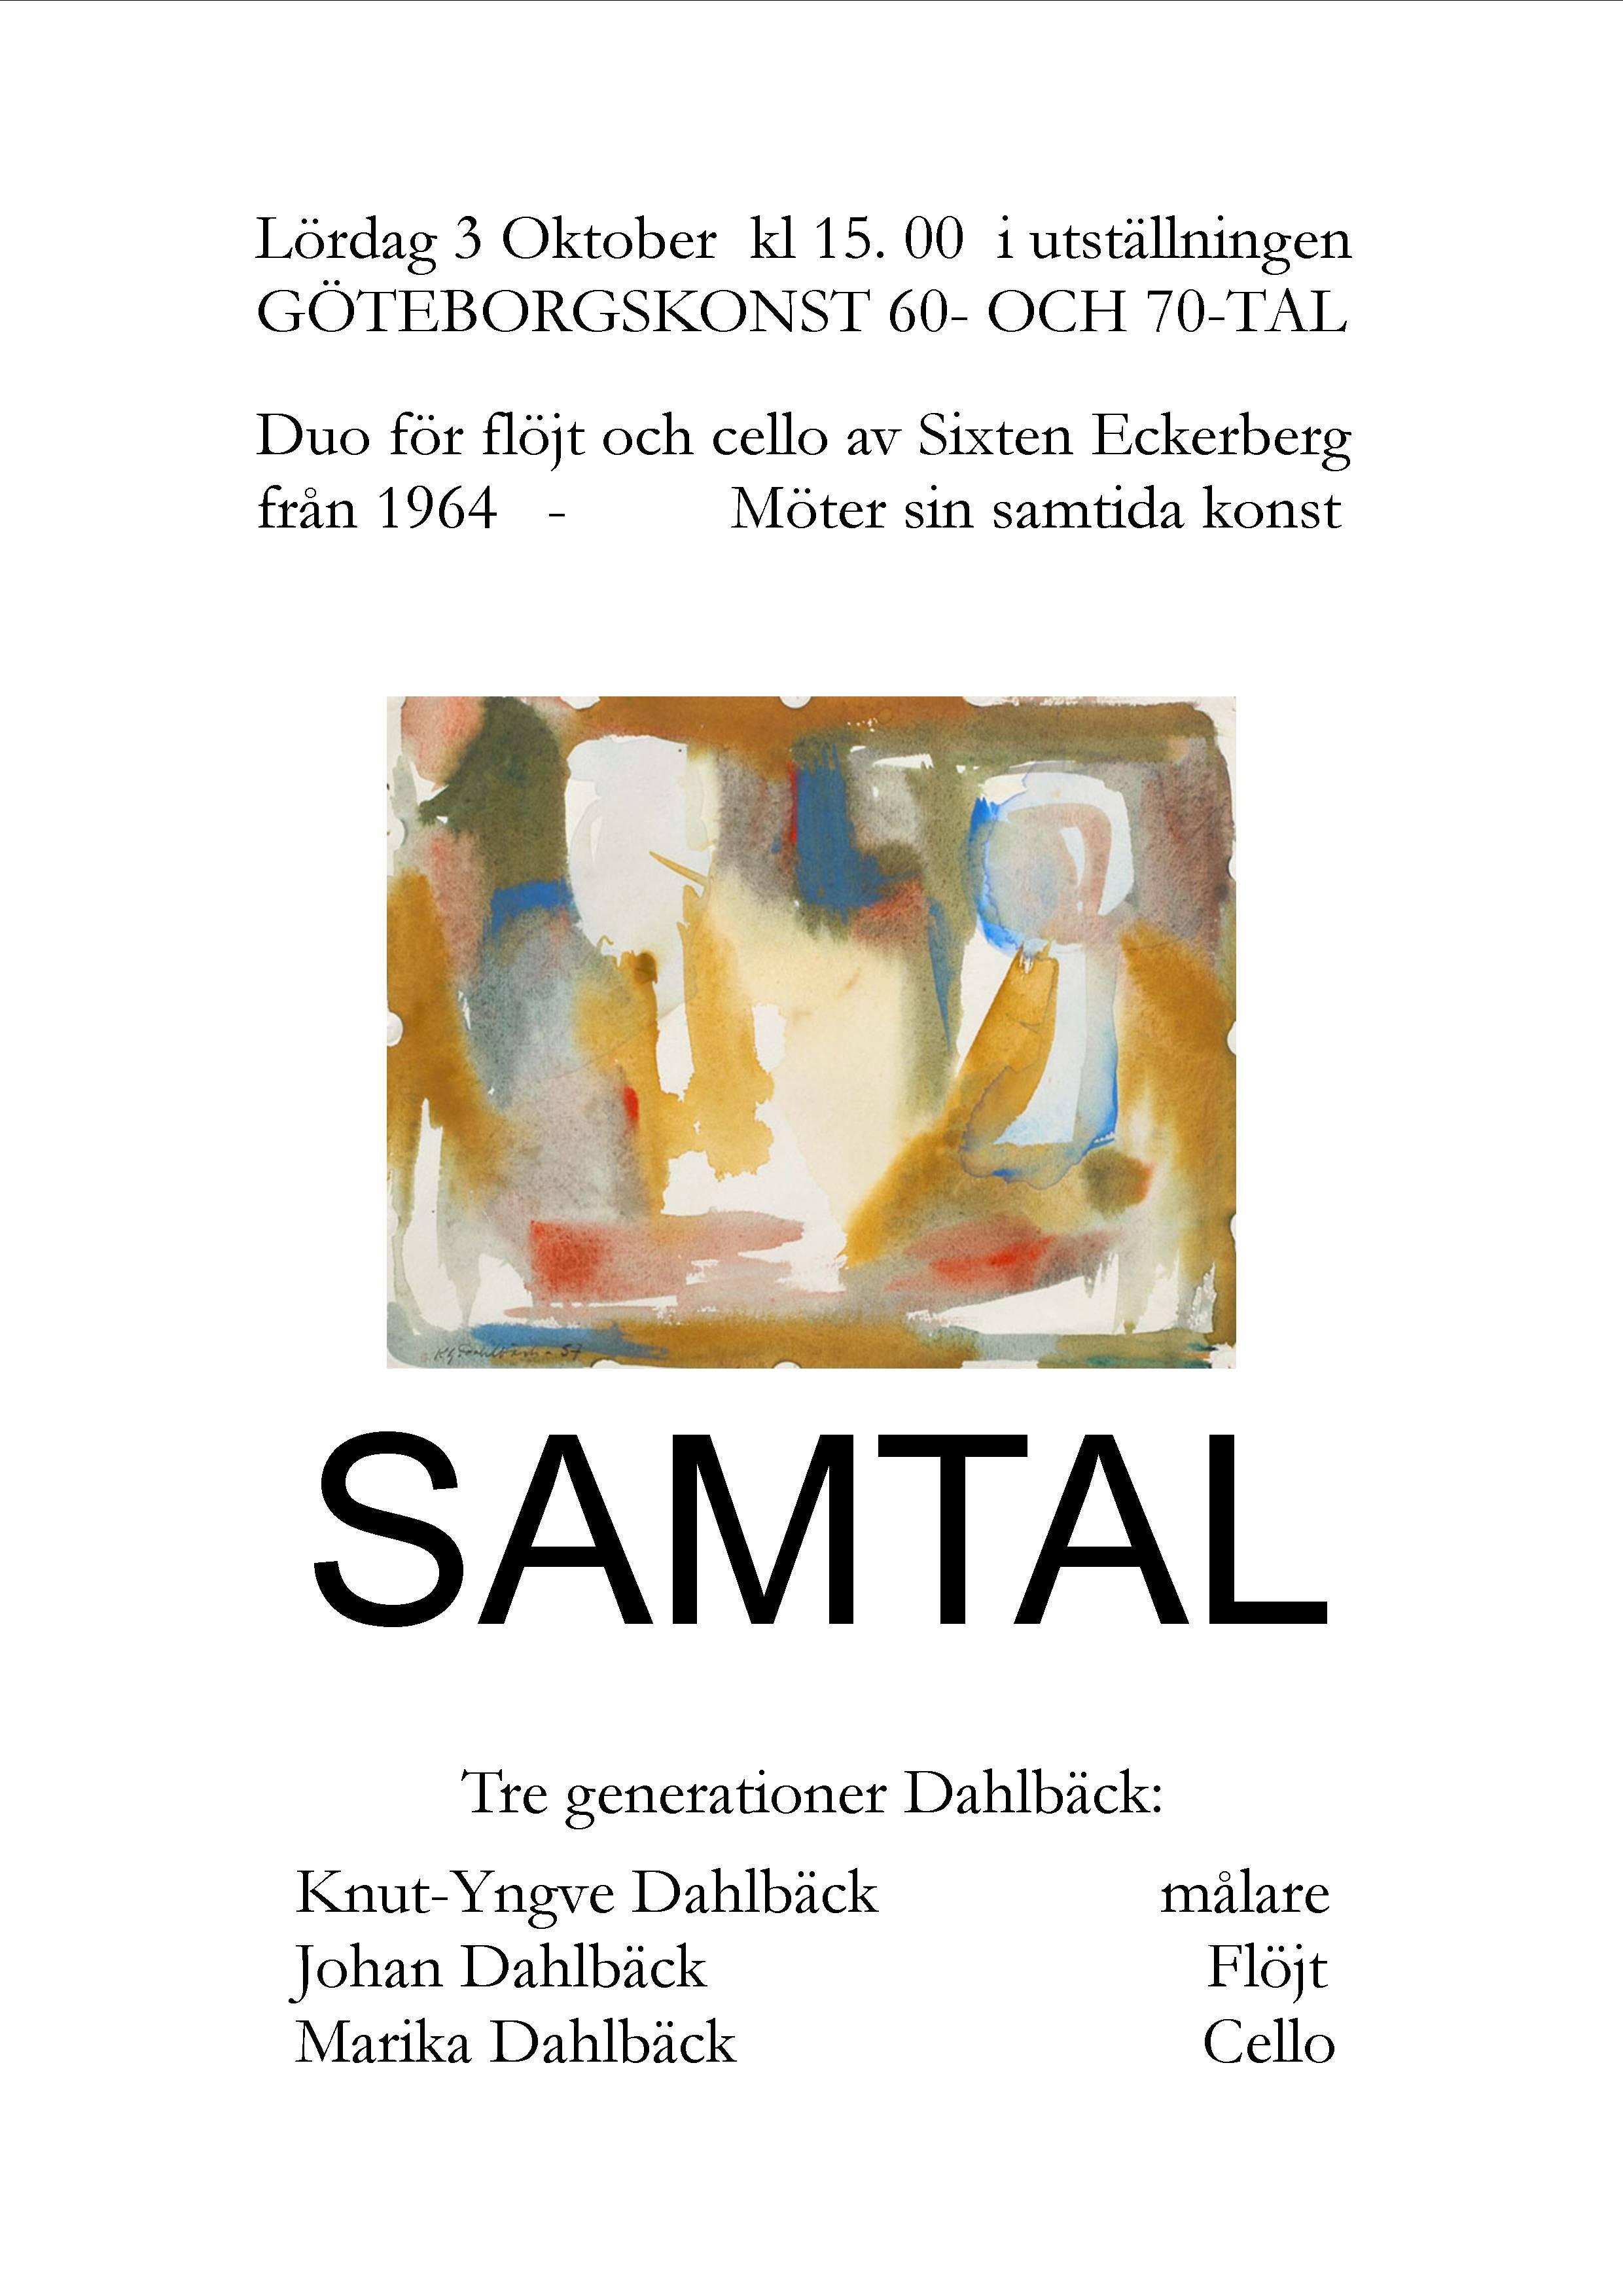 SAMTAL